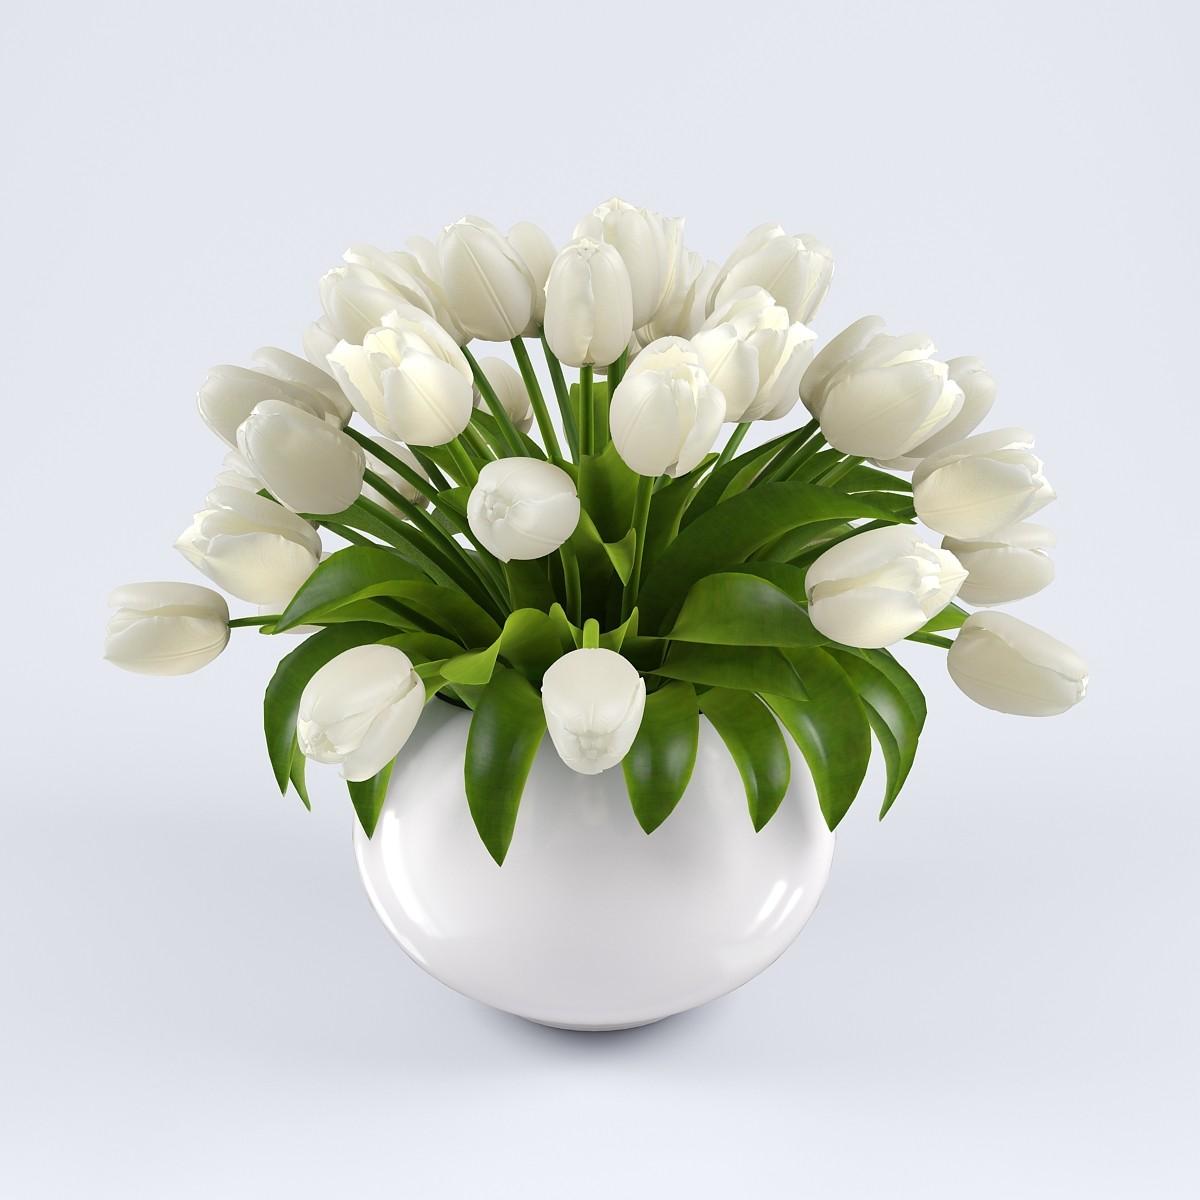 pr_tulips_vase2_2_3.jpg